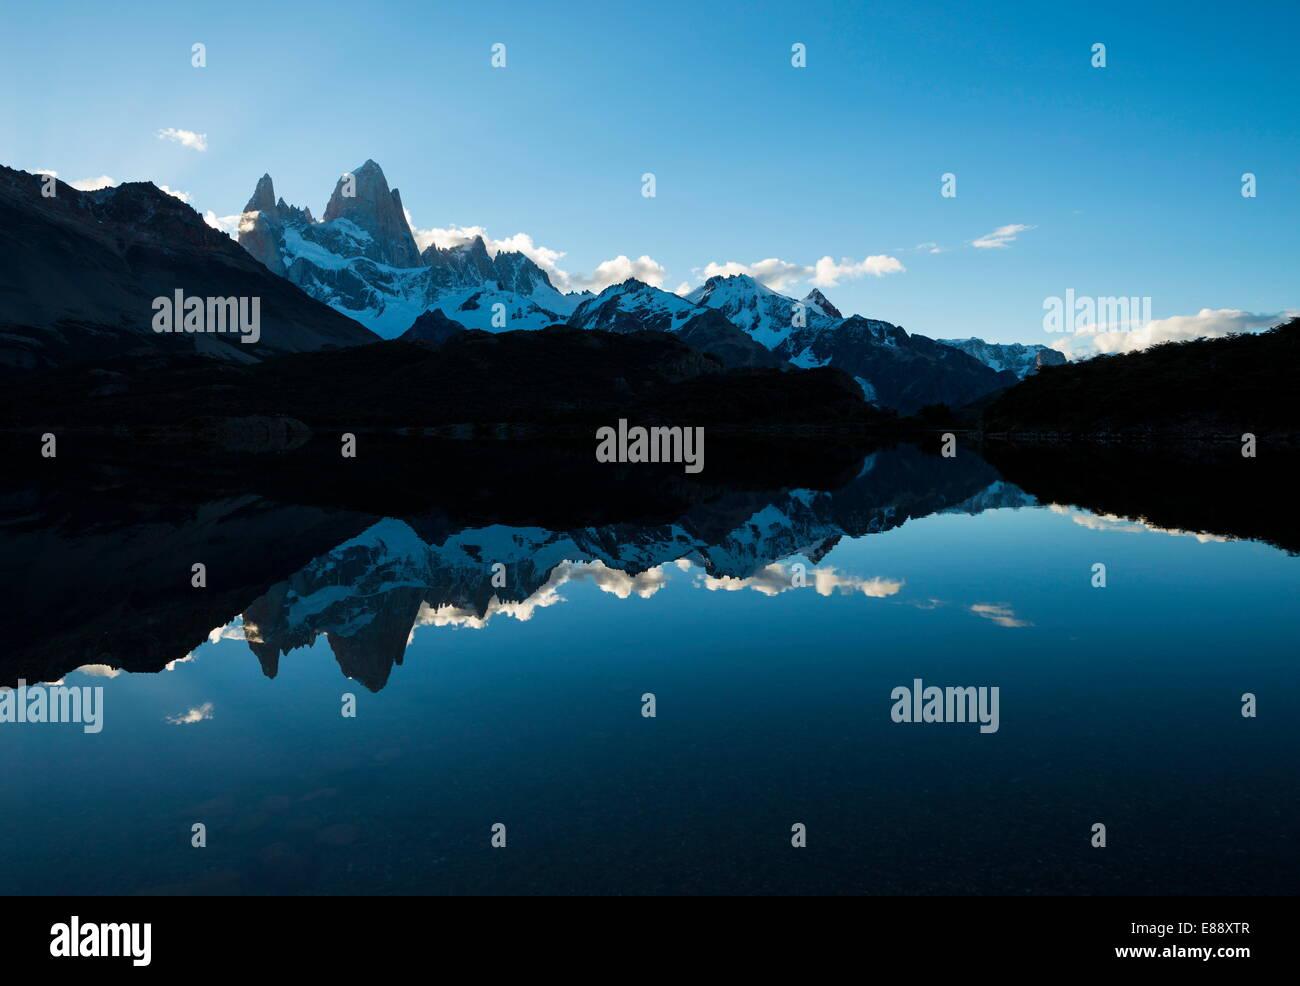 Fitz Roy Bergkette, Laguna Capri, der Nationalpark Los Glaciares, der UNESCO, Provinz Santa Cruz, Argentinien Stockbild